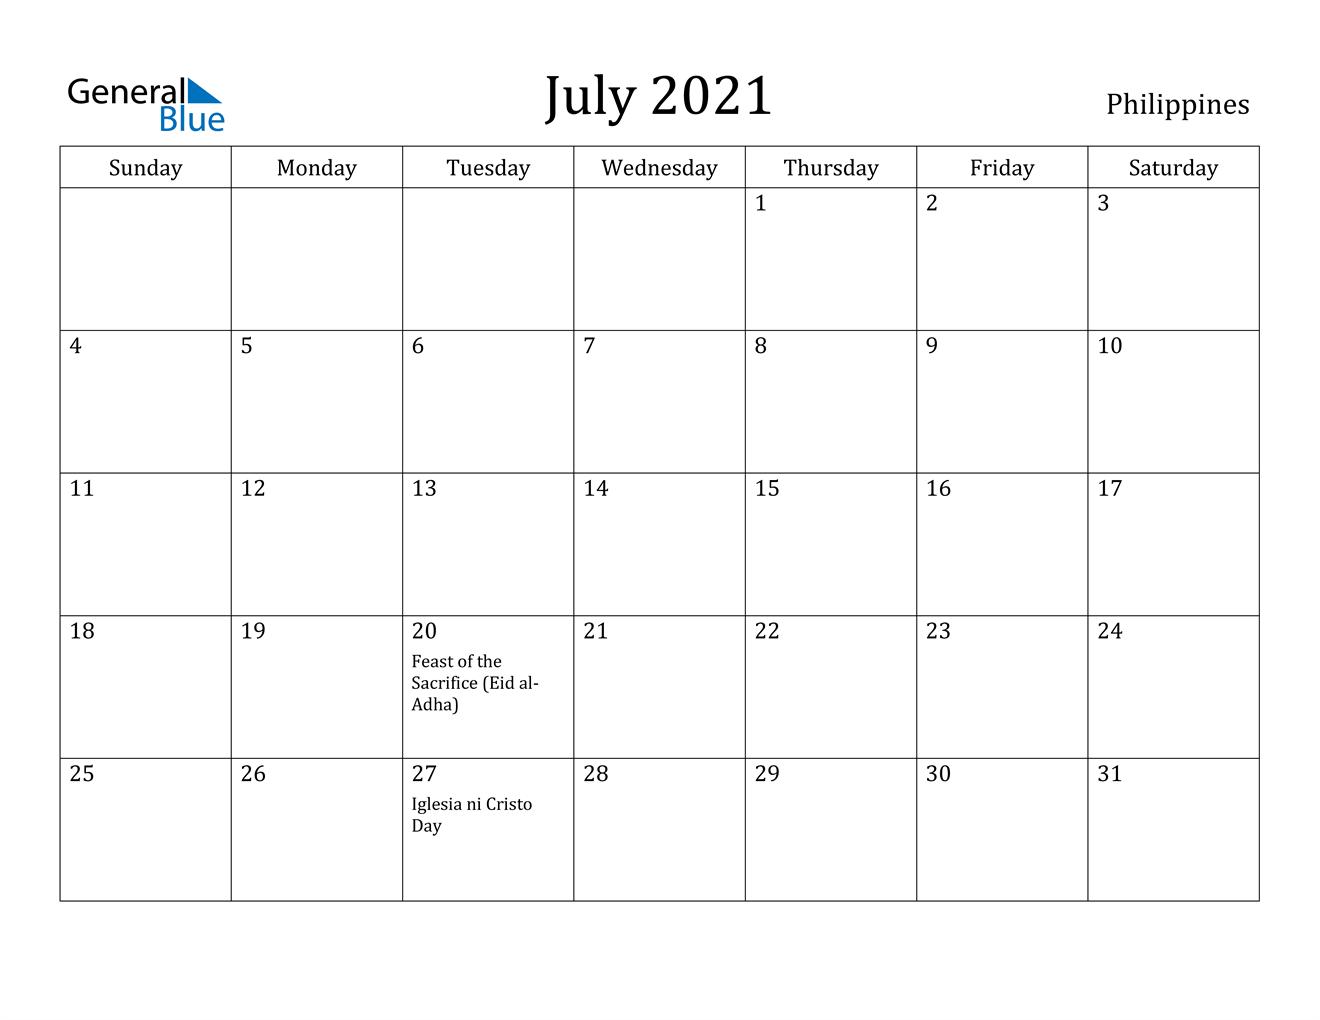 July 2021 Calendar - Philippines